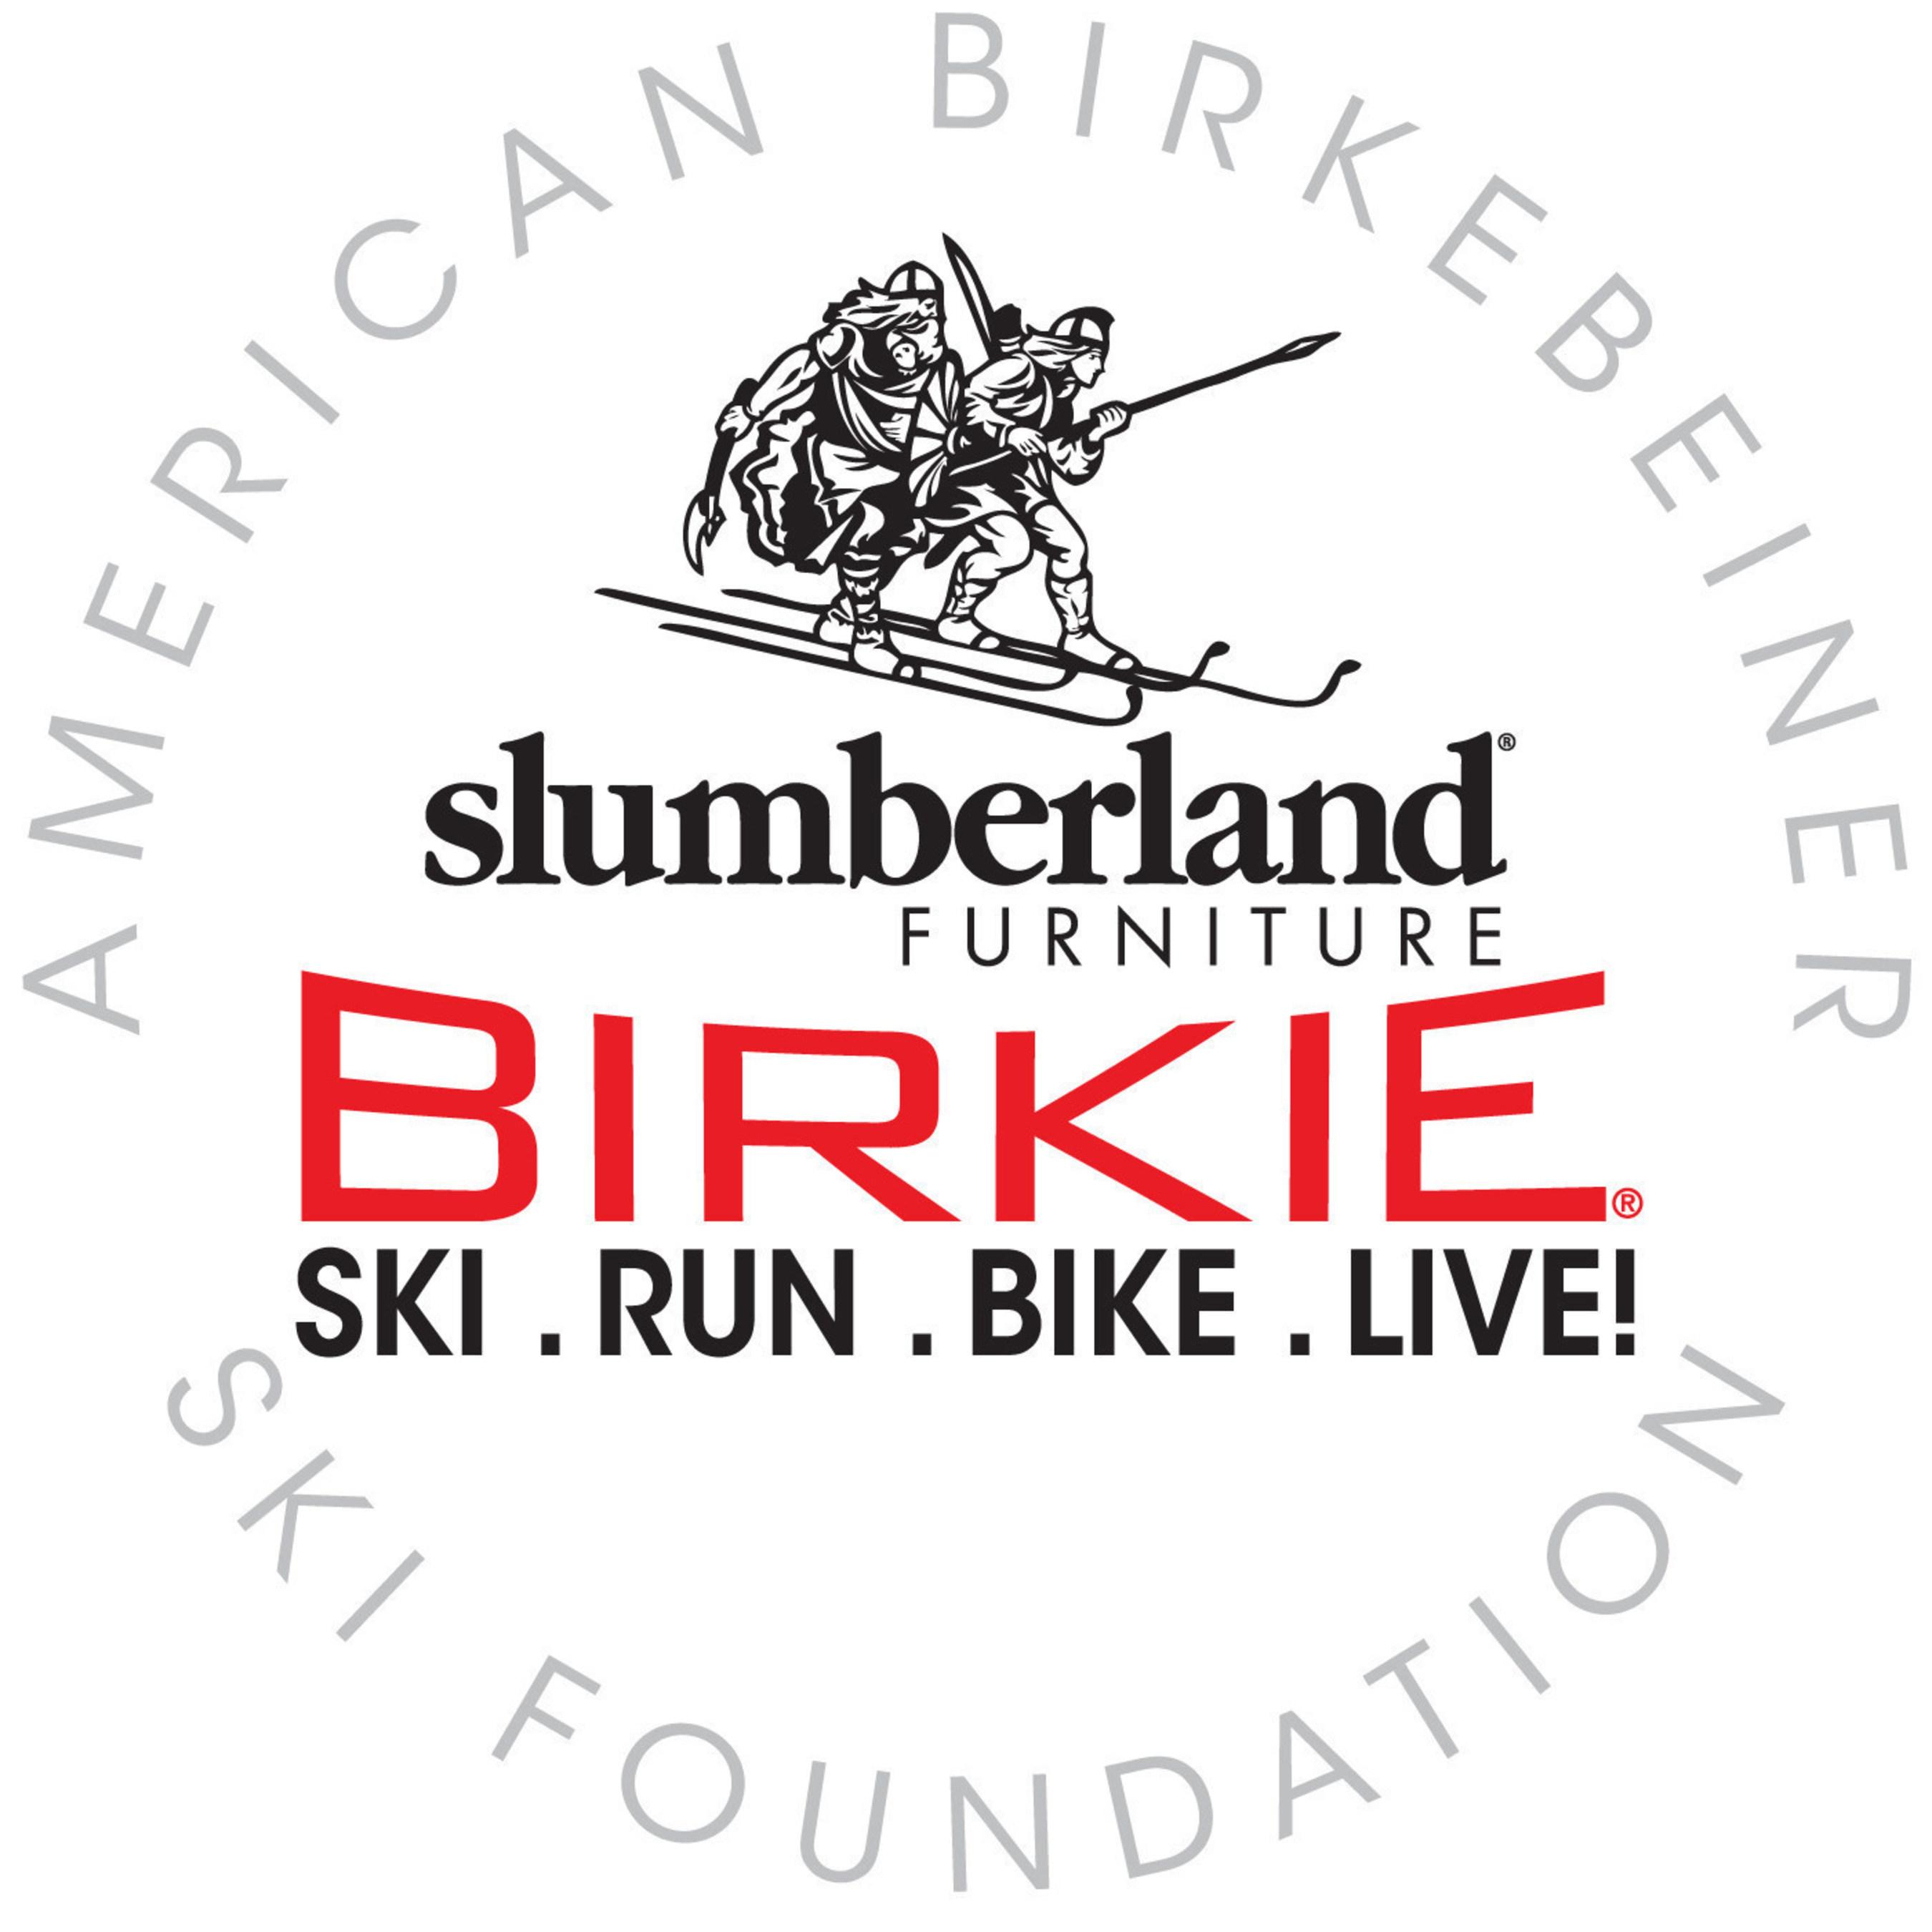 Birkie Names Slumberland Furniture As New Title Sponsor